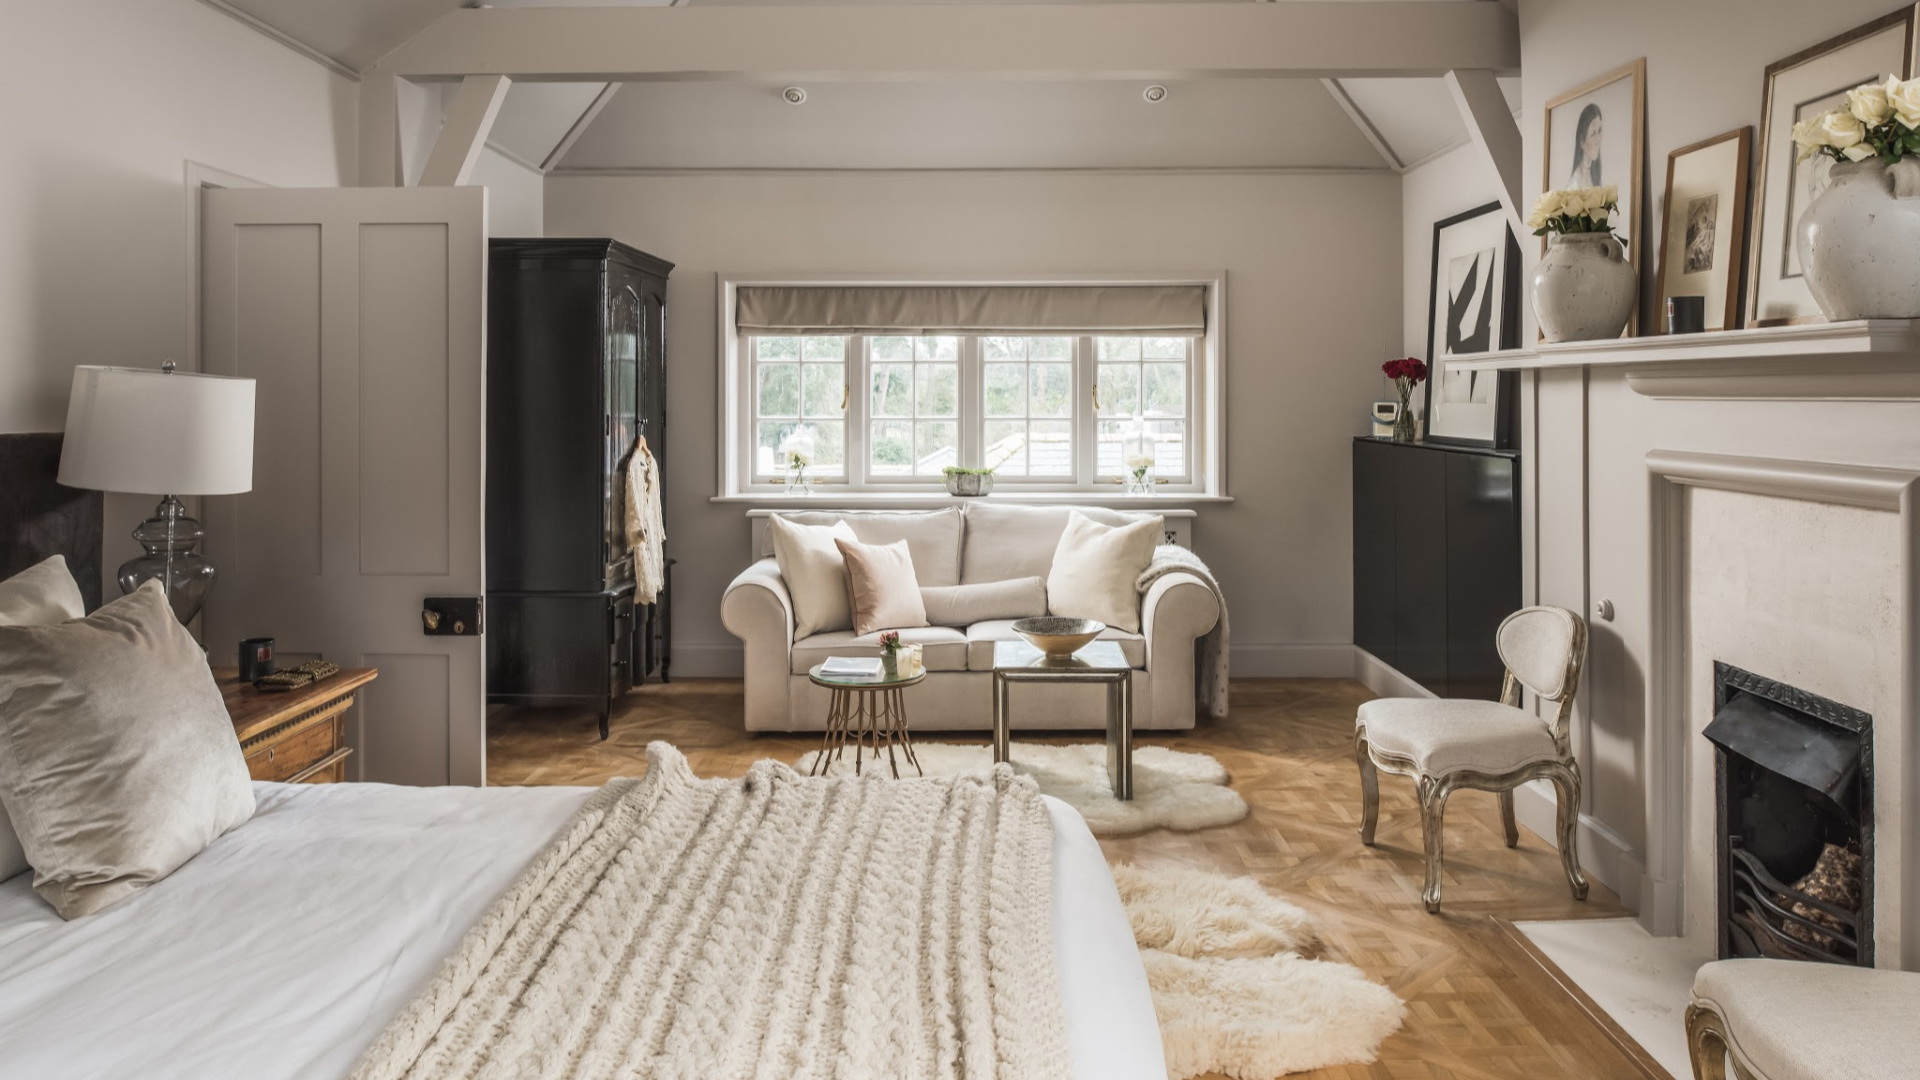 Unique places to stay - Unique Home Stays - Ariabelle - Humphrey Munson